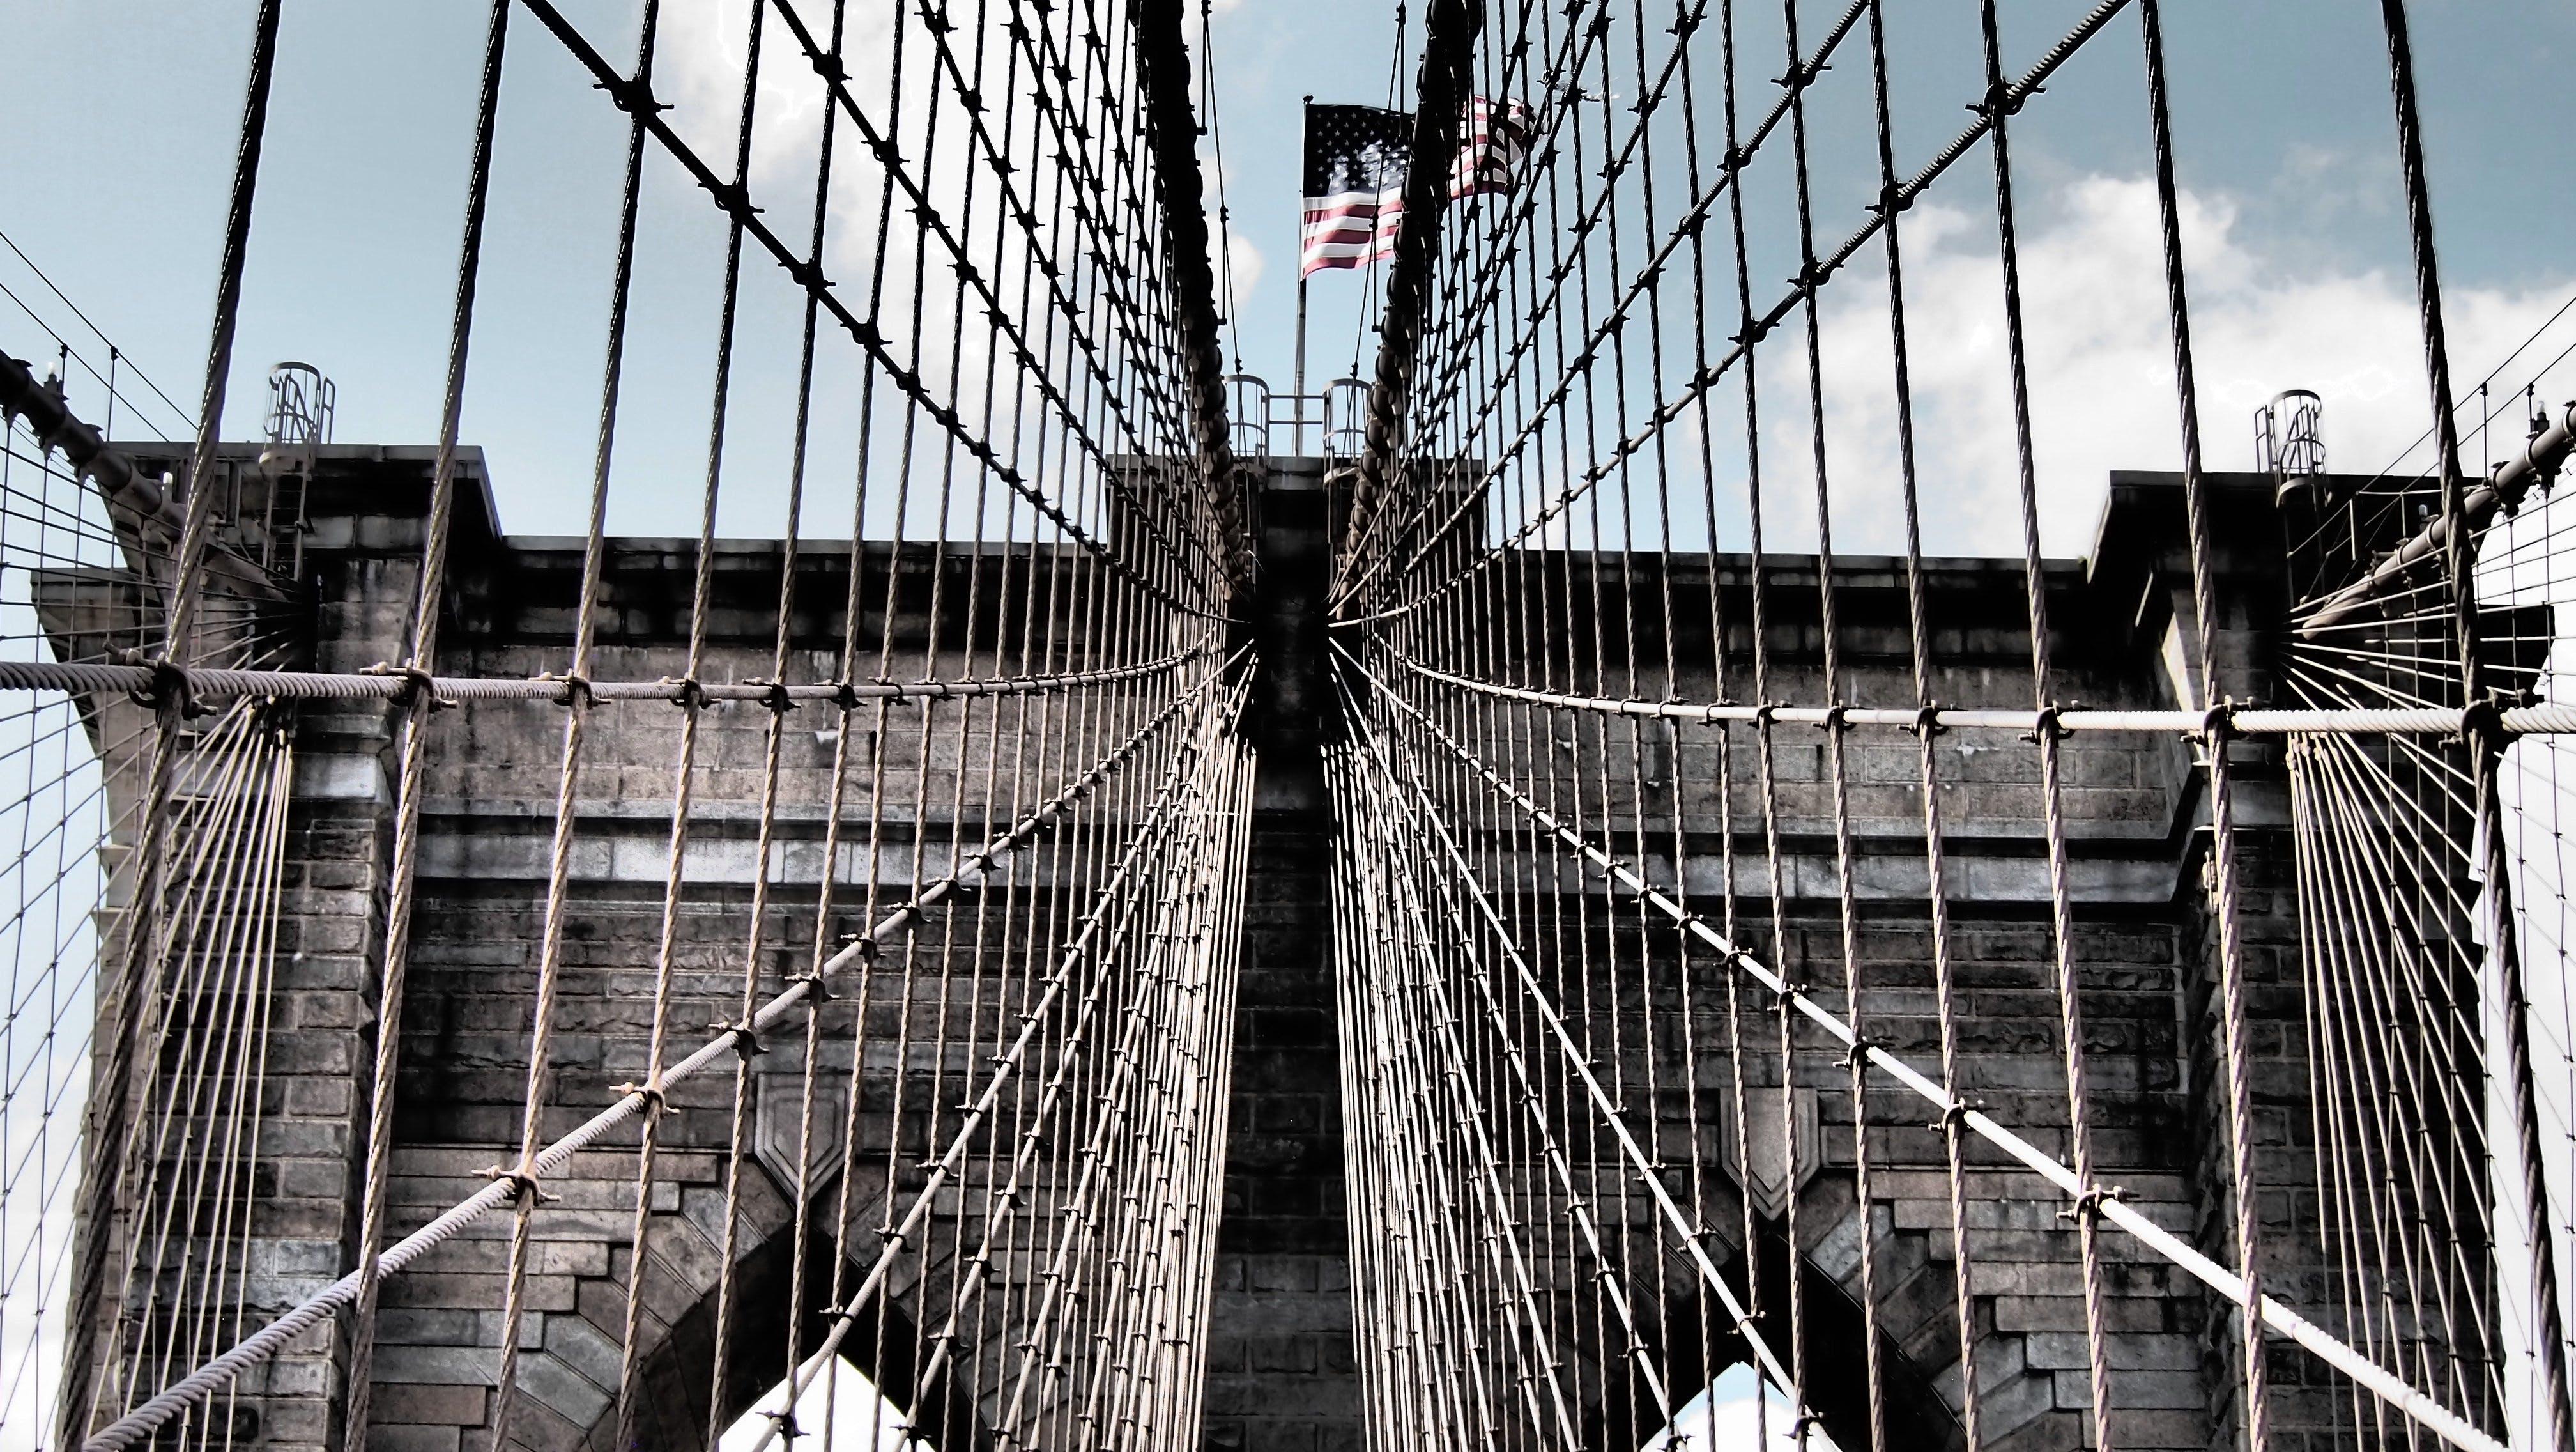 Brooklyn Köprüsü, köprü, mimari, New York içeren Ücretsiz stok fotoğraf